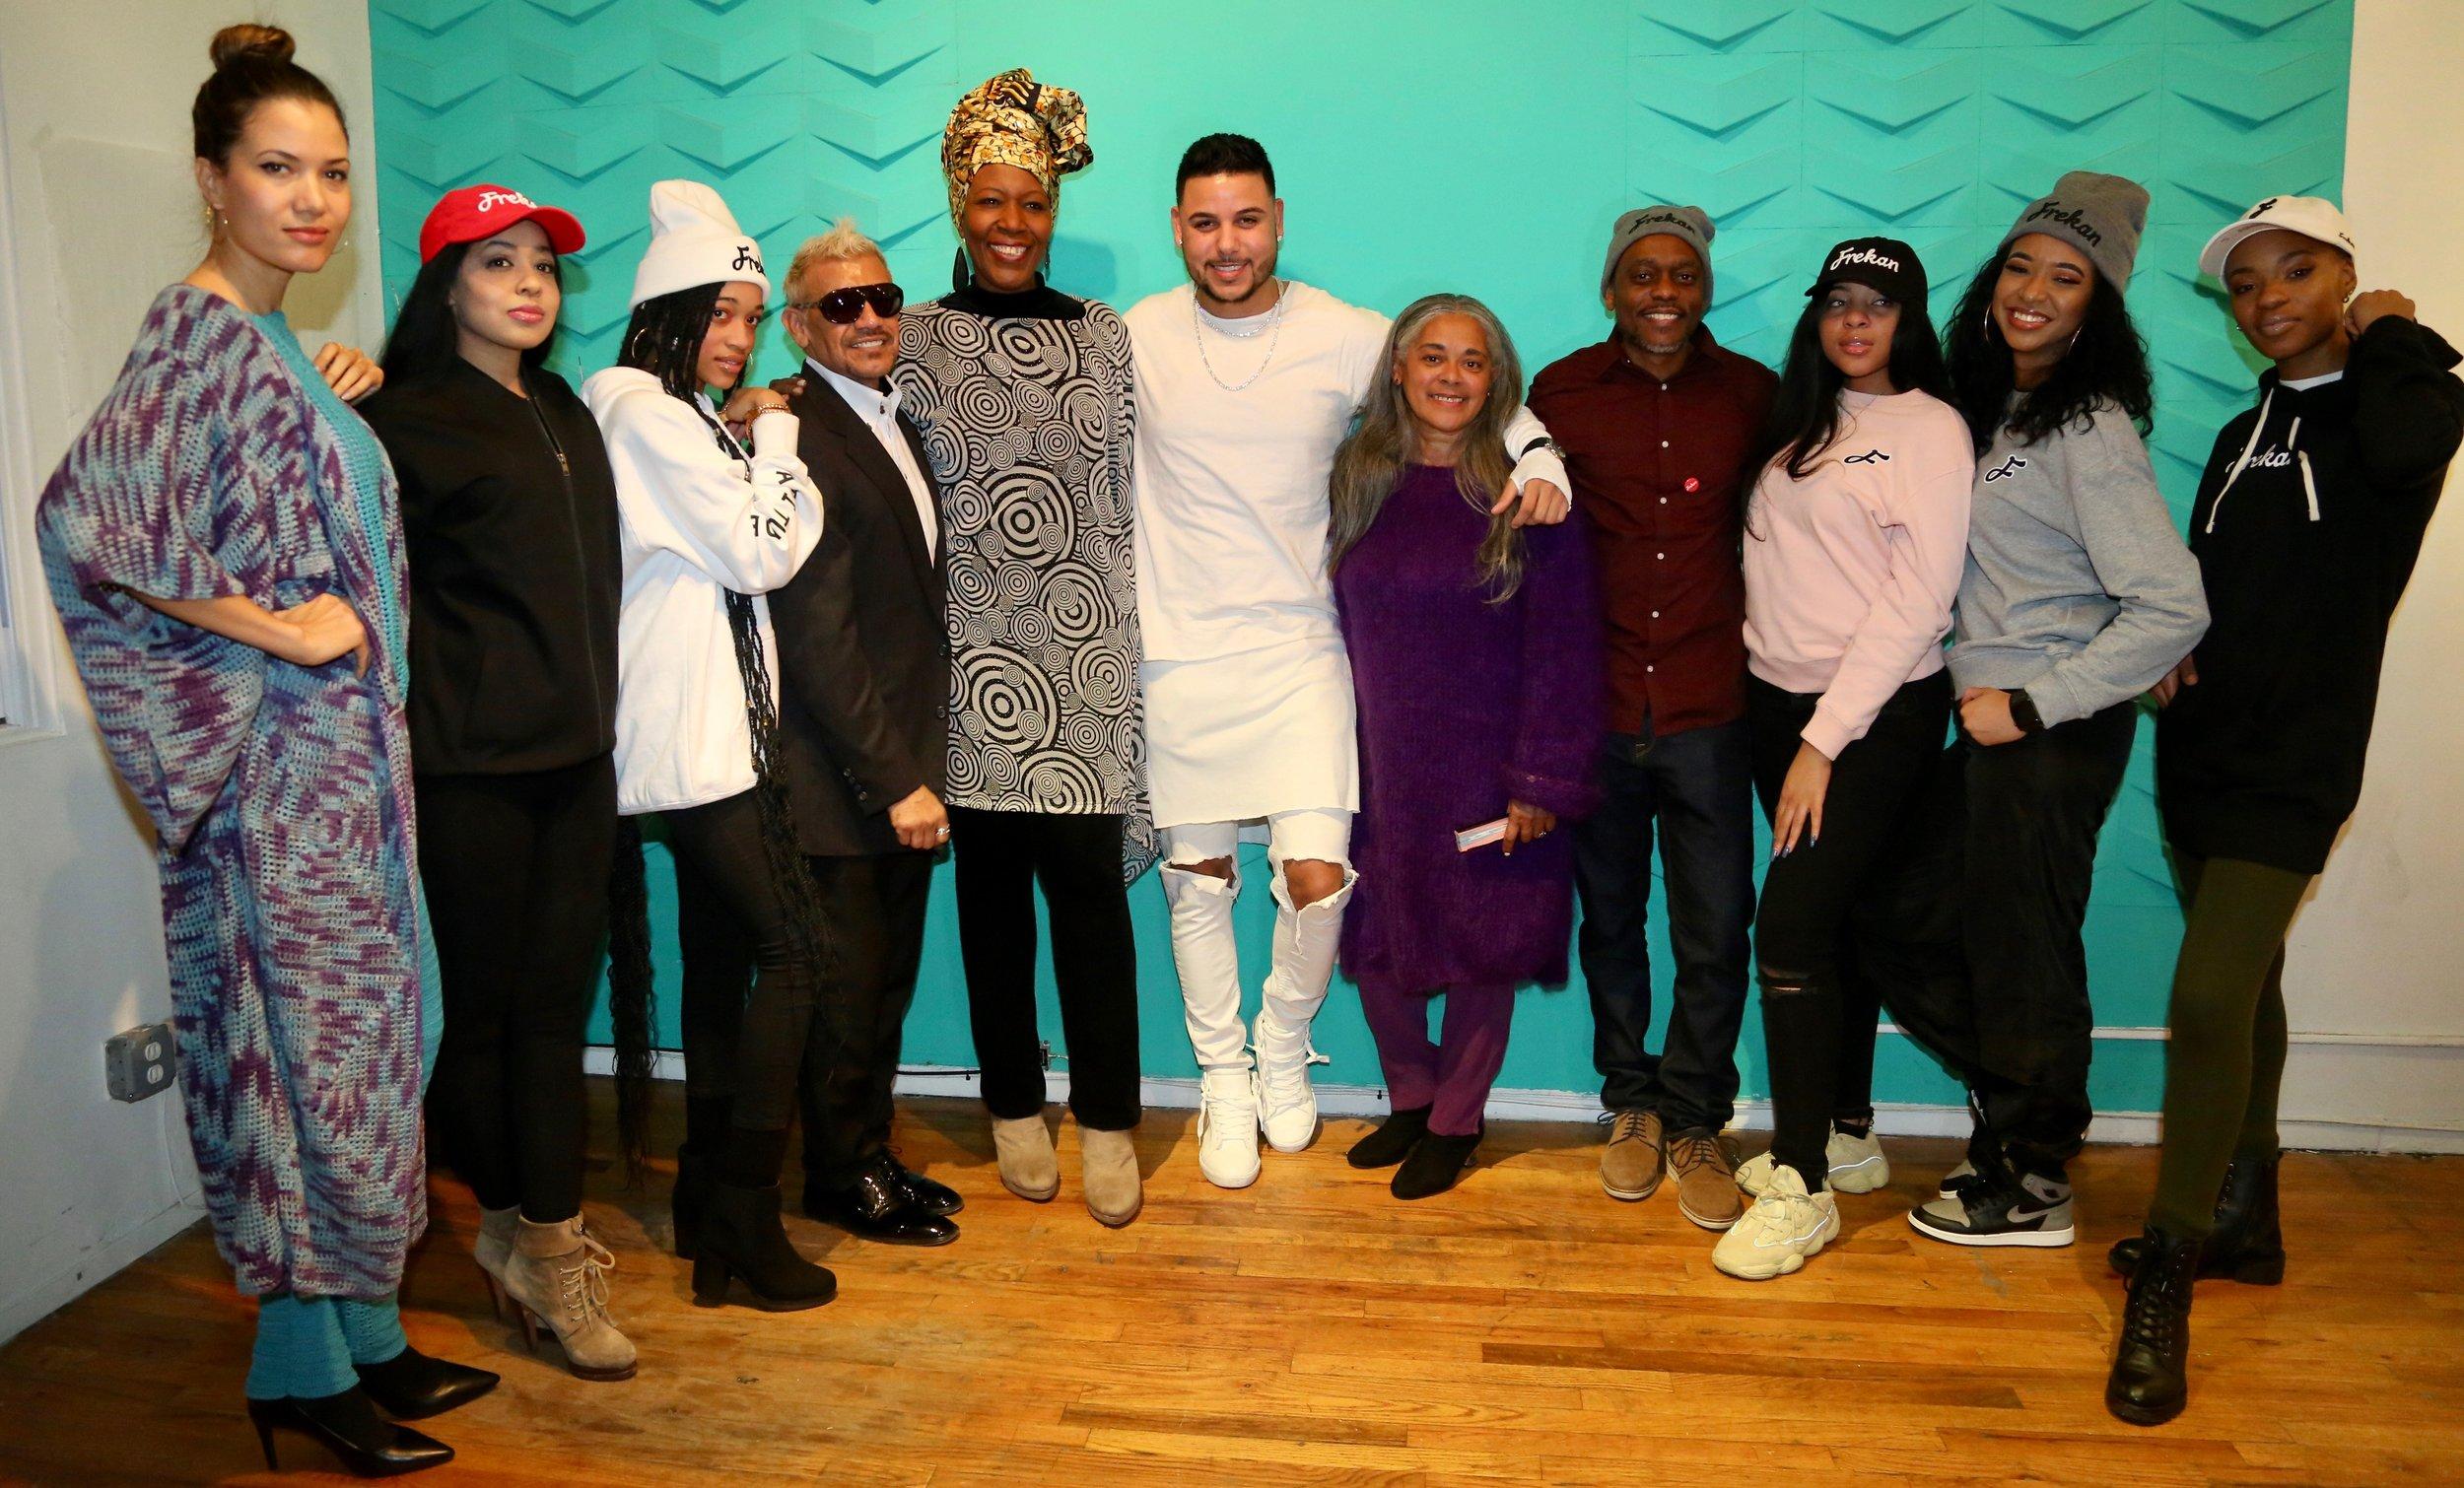 CAFE @ NYFW - with Fernando Bernierd, KLASS Santana and designers: Milagros Batista and Edwin Bellevue and models.